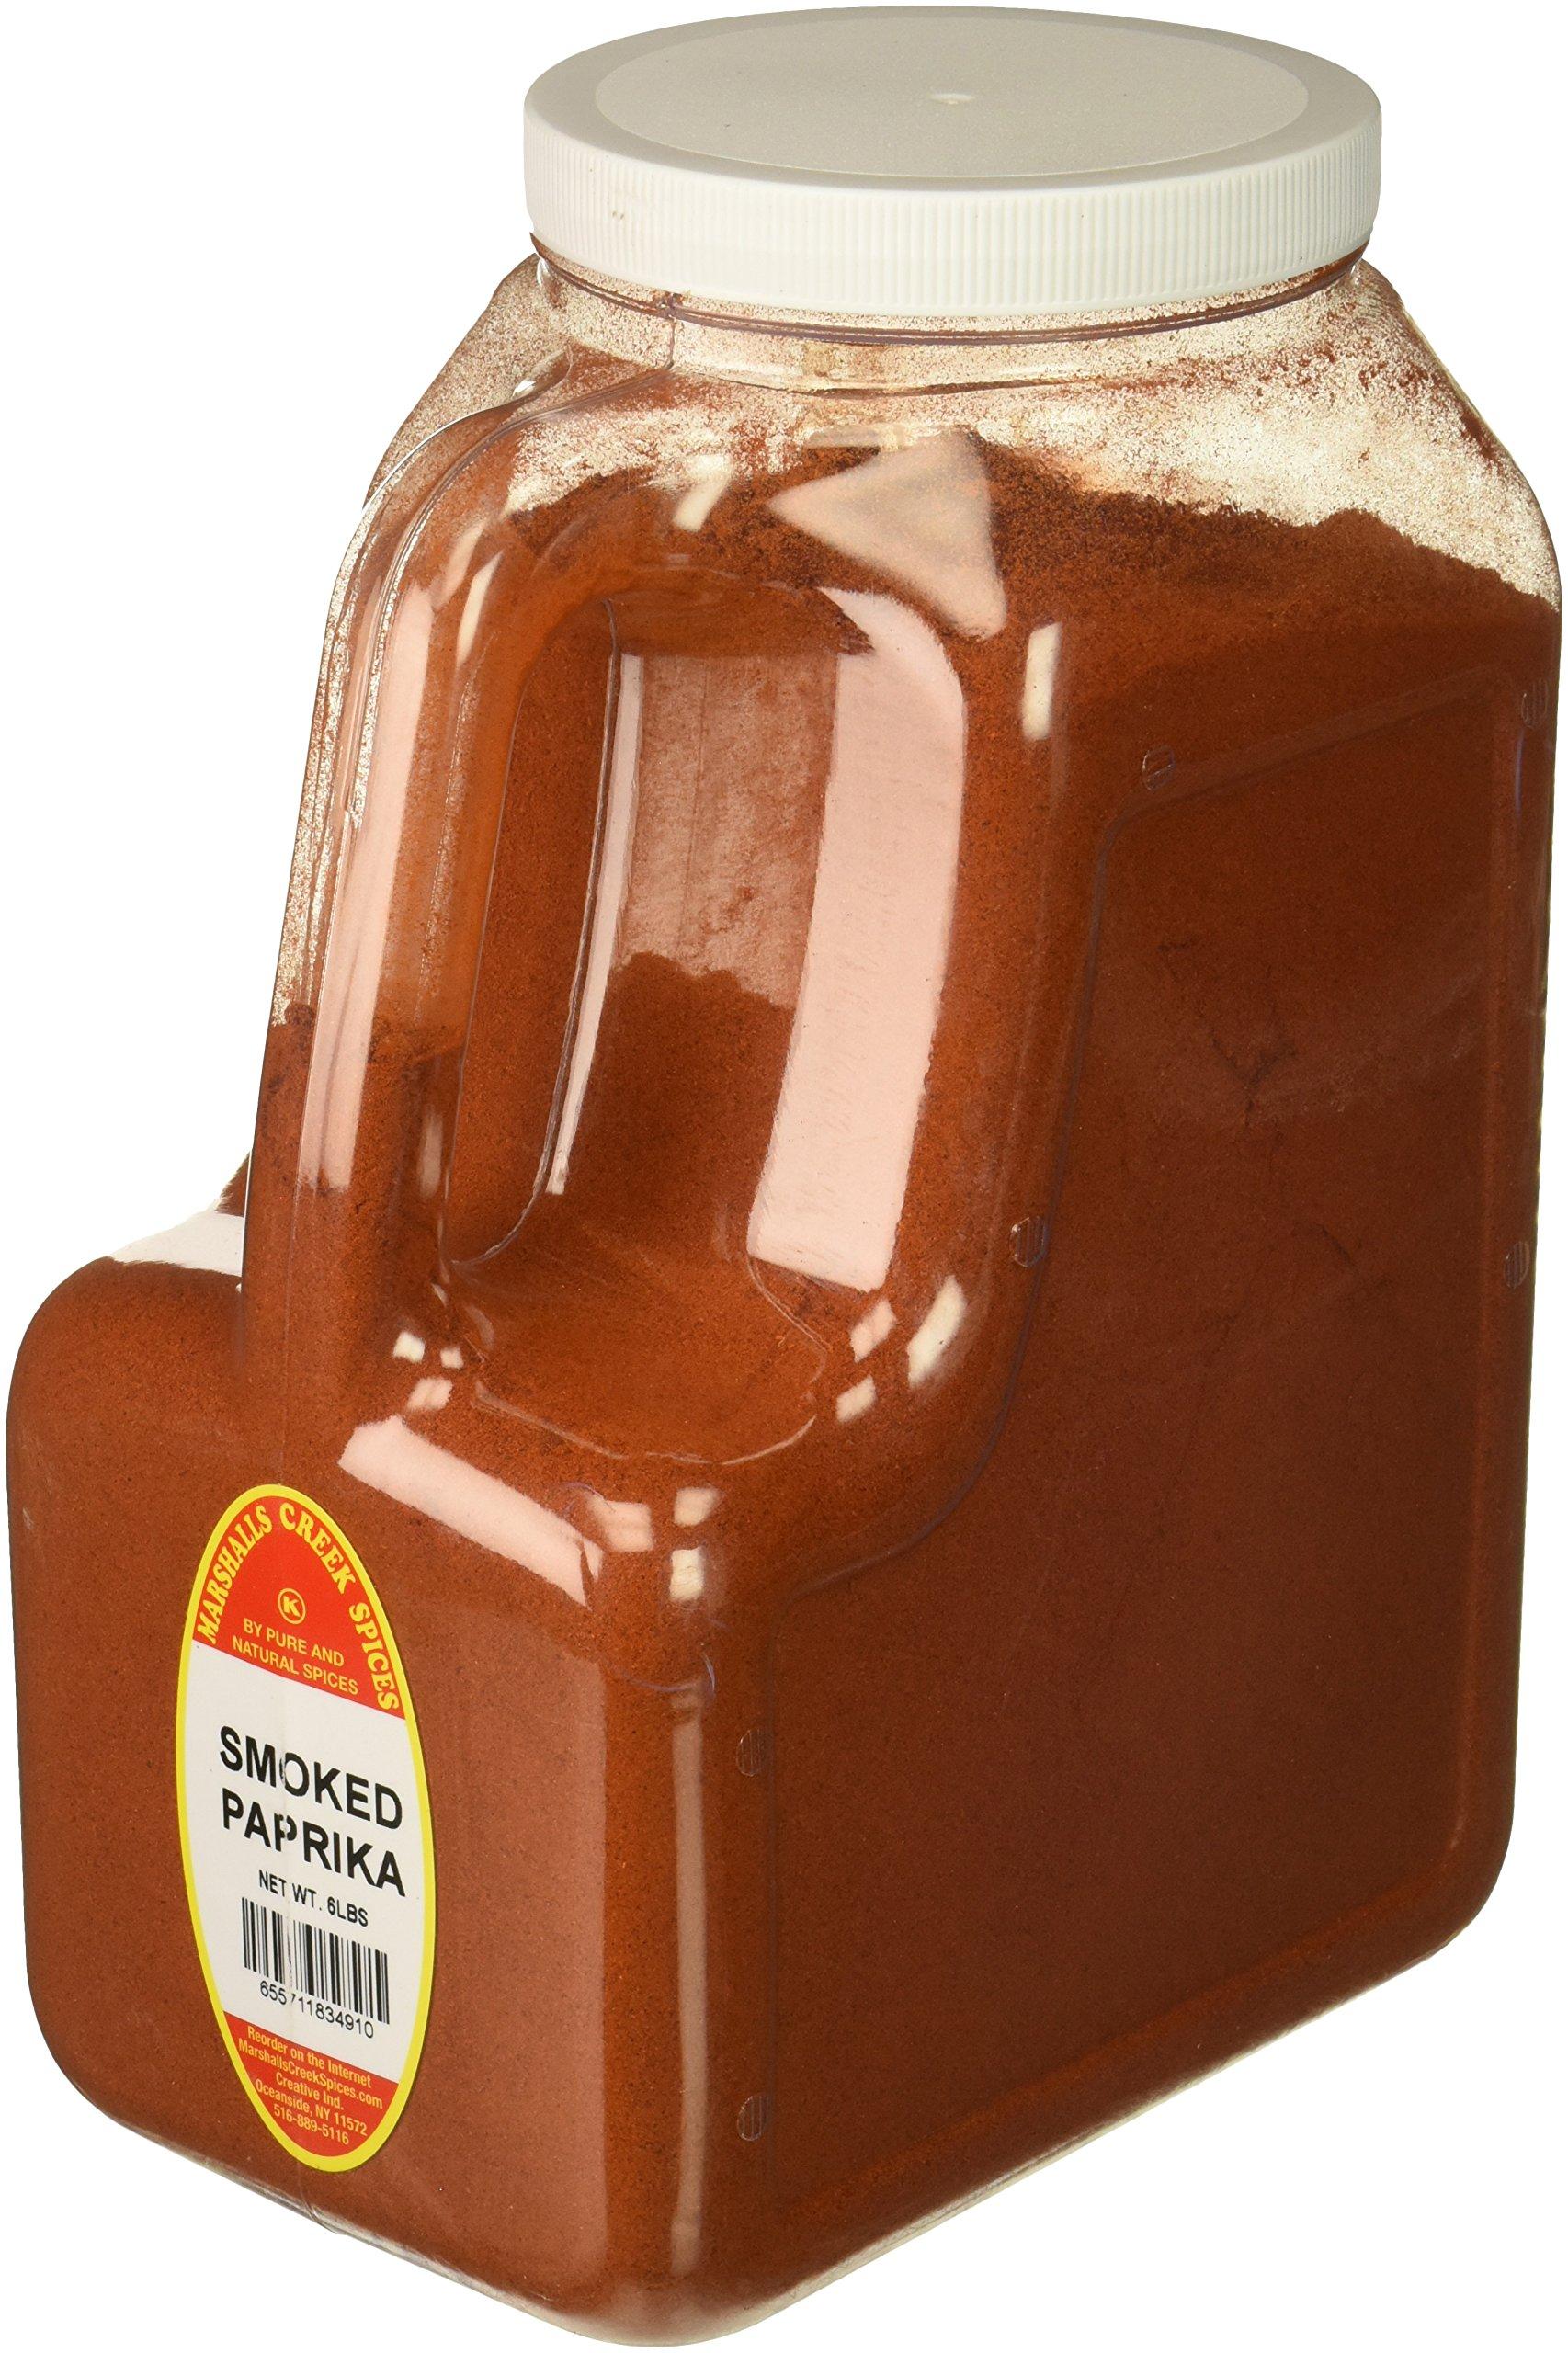 Marshalls Creek Spices SMOKED PAPRIKA 6 LB RESTAURANT SIZE JUG, 6 Pound